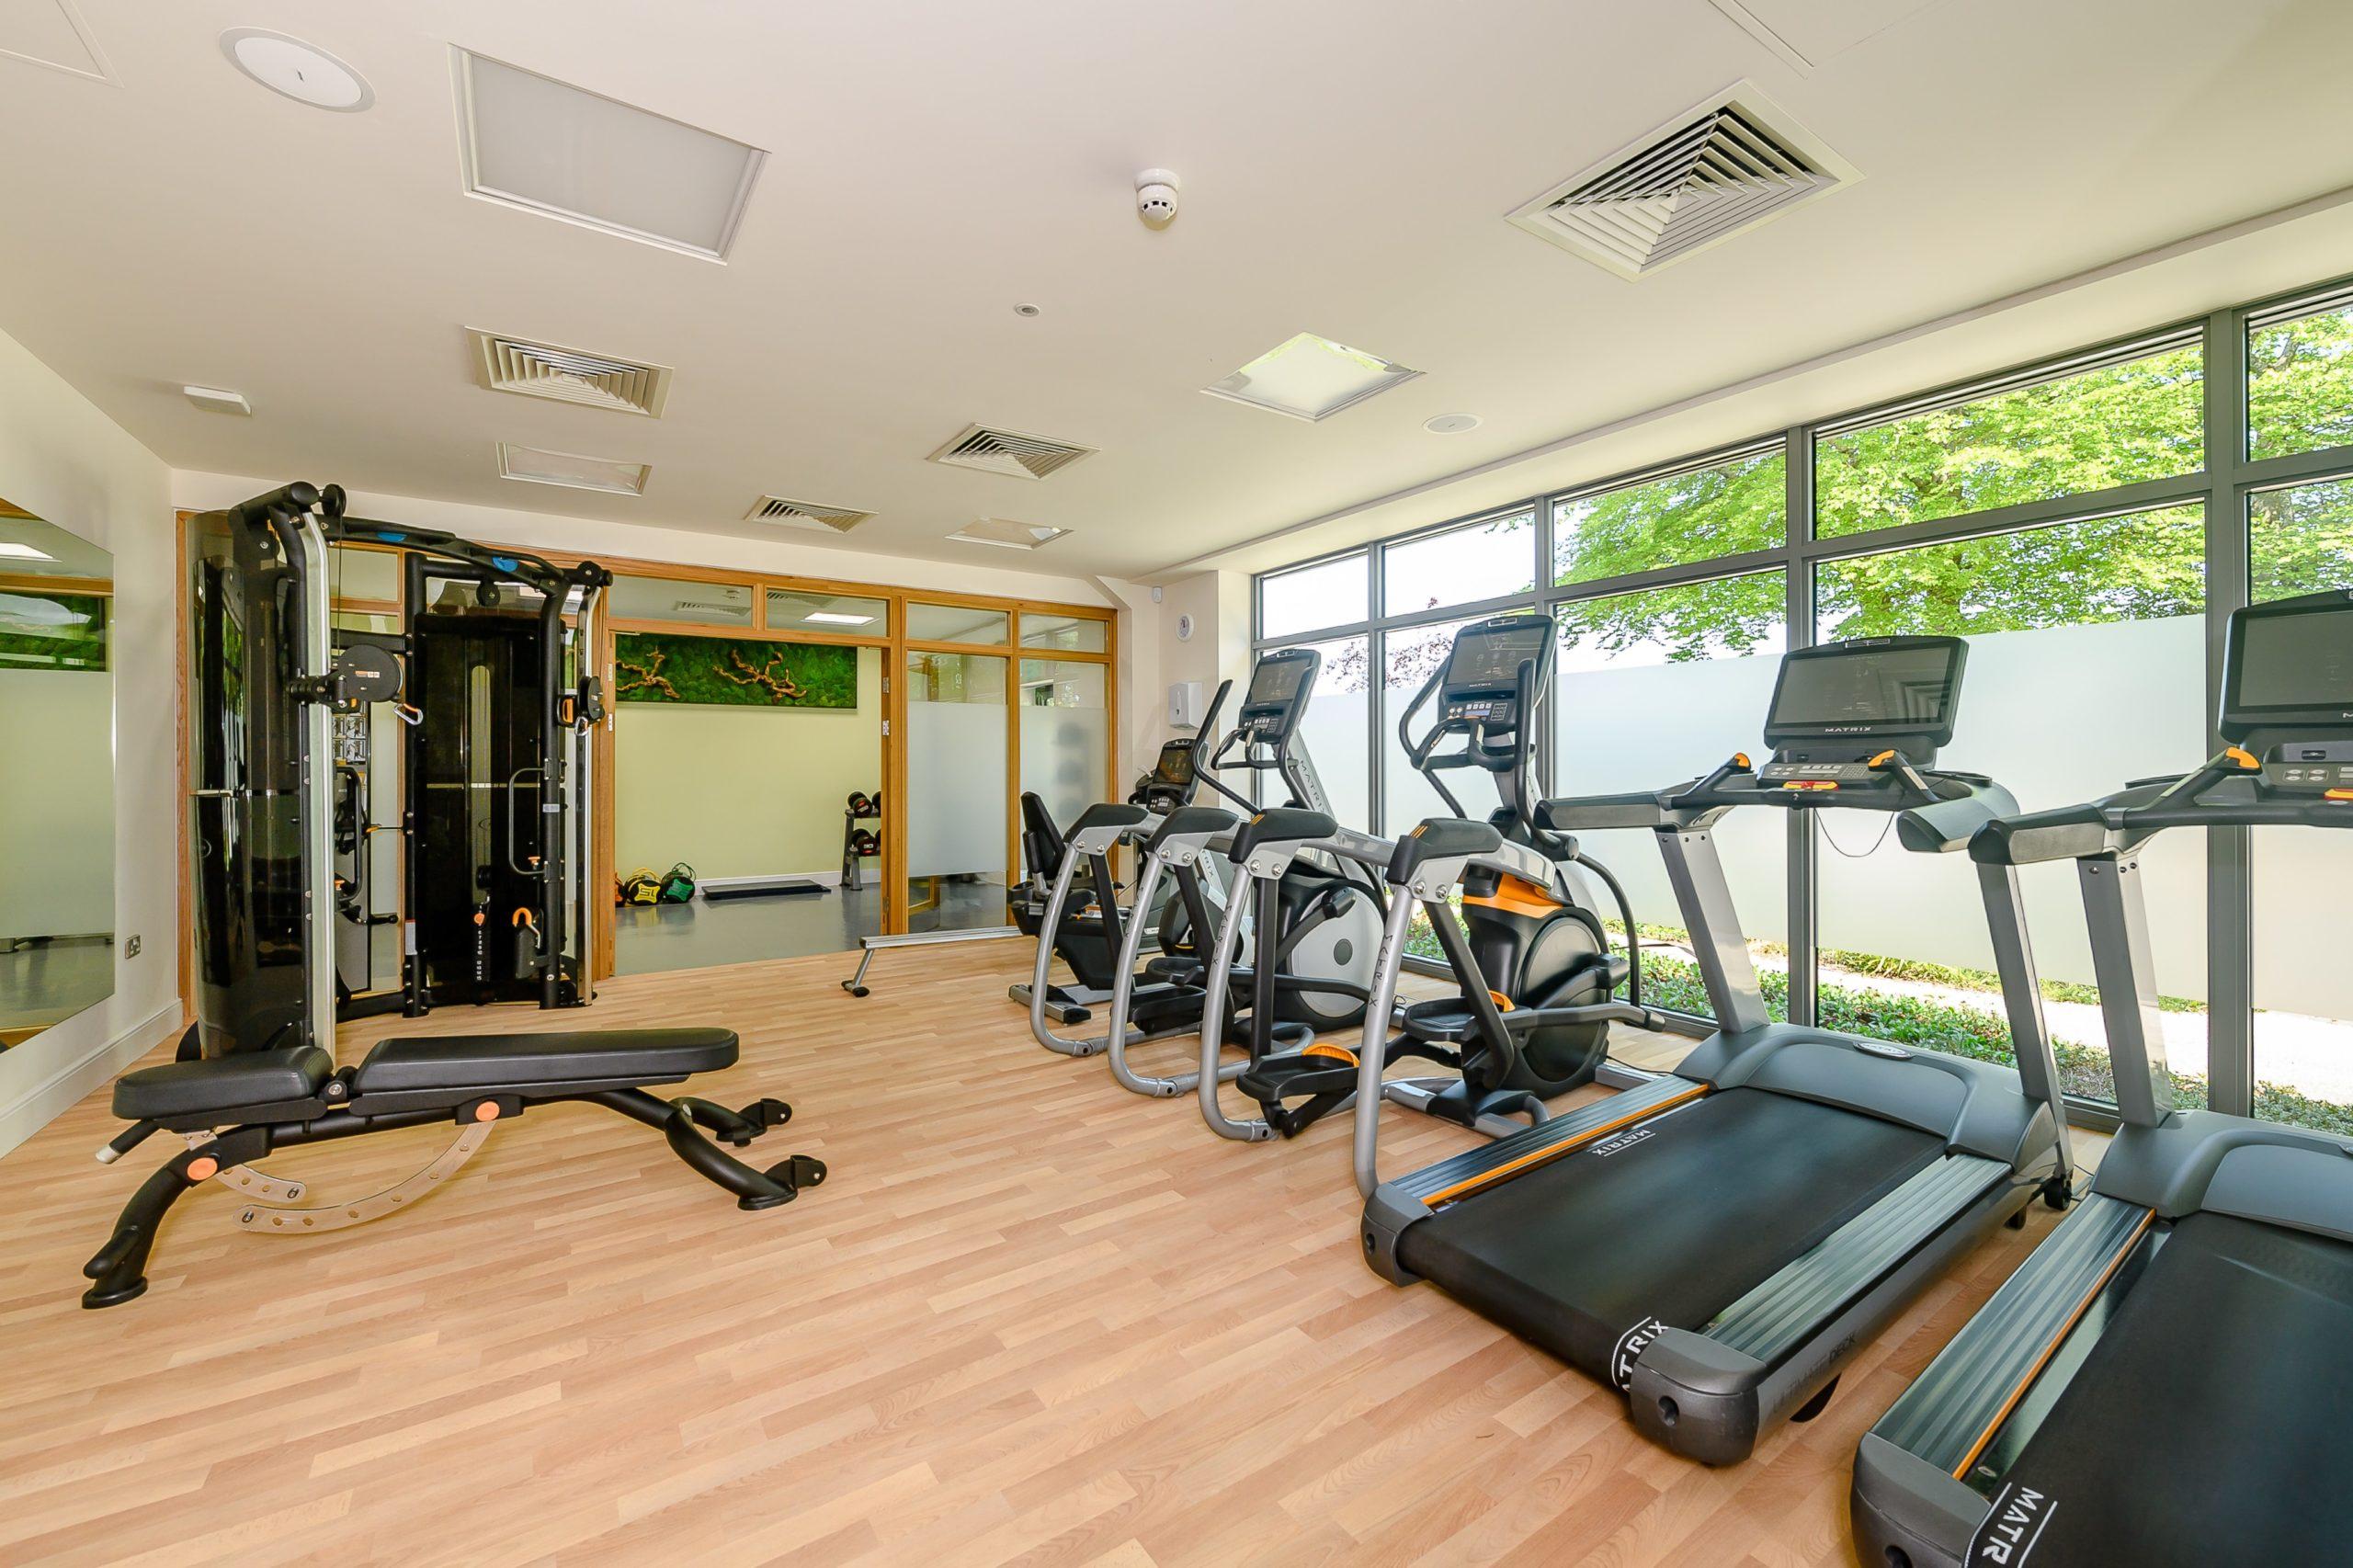 Interior photo of the gym at hawkchurch